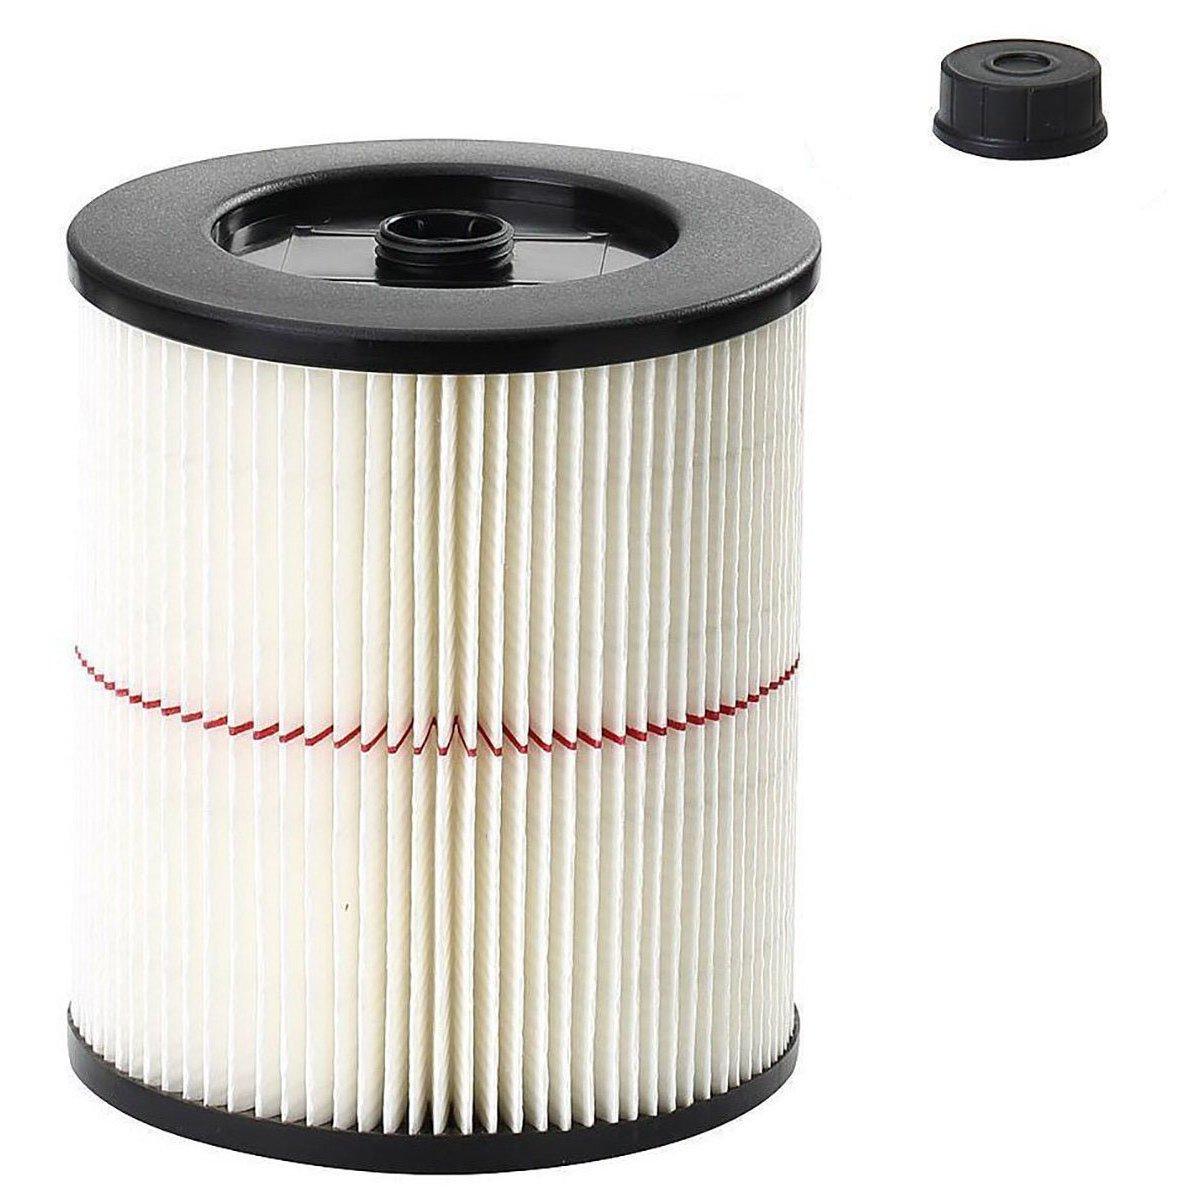 VACFIT Filter for Shop VAC & Craftsman 17816 9-17816 Replacement Cartridge Filter for Craftsman Wet Dry VAC 5 and Larger Gallon Vacuum Cleaner Accessories 1 Pack